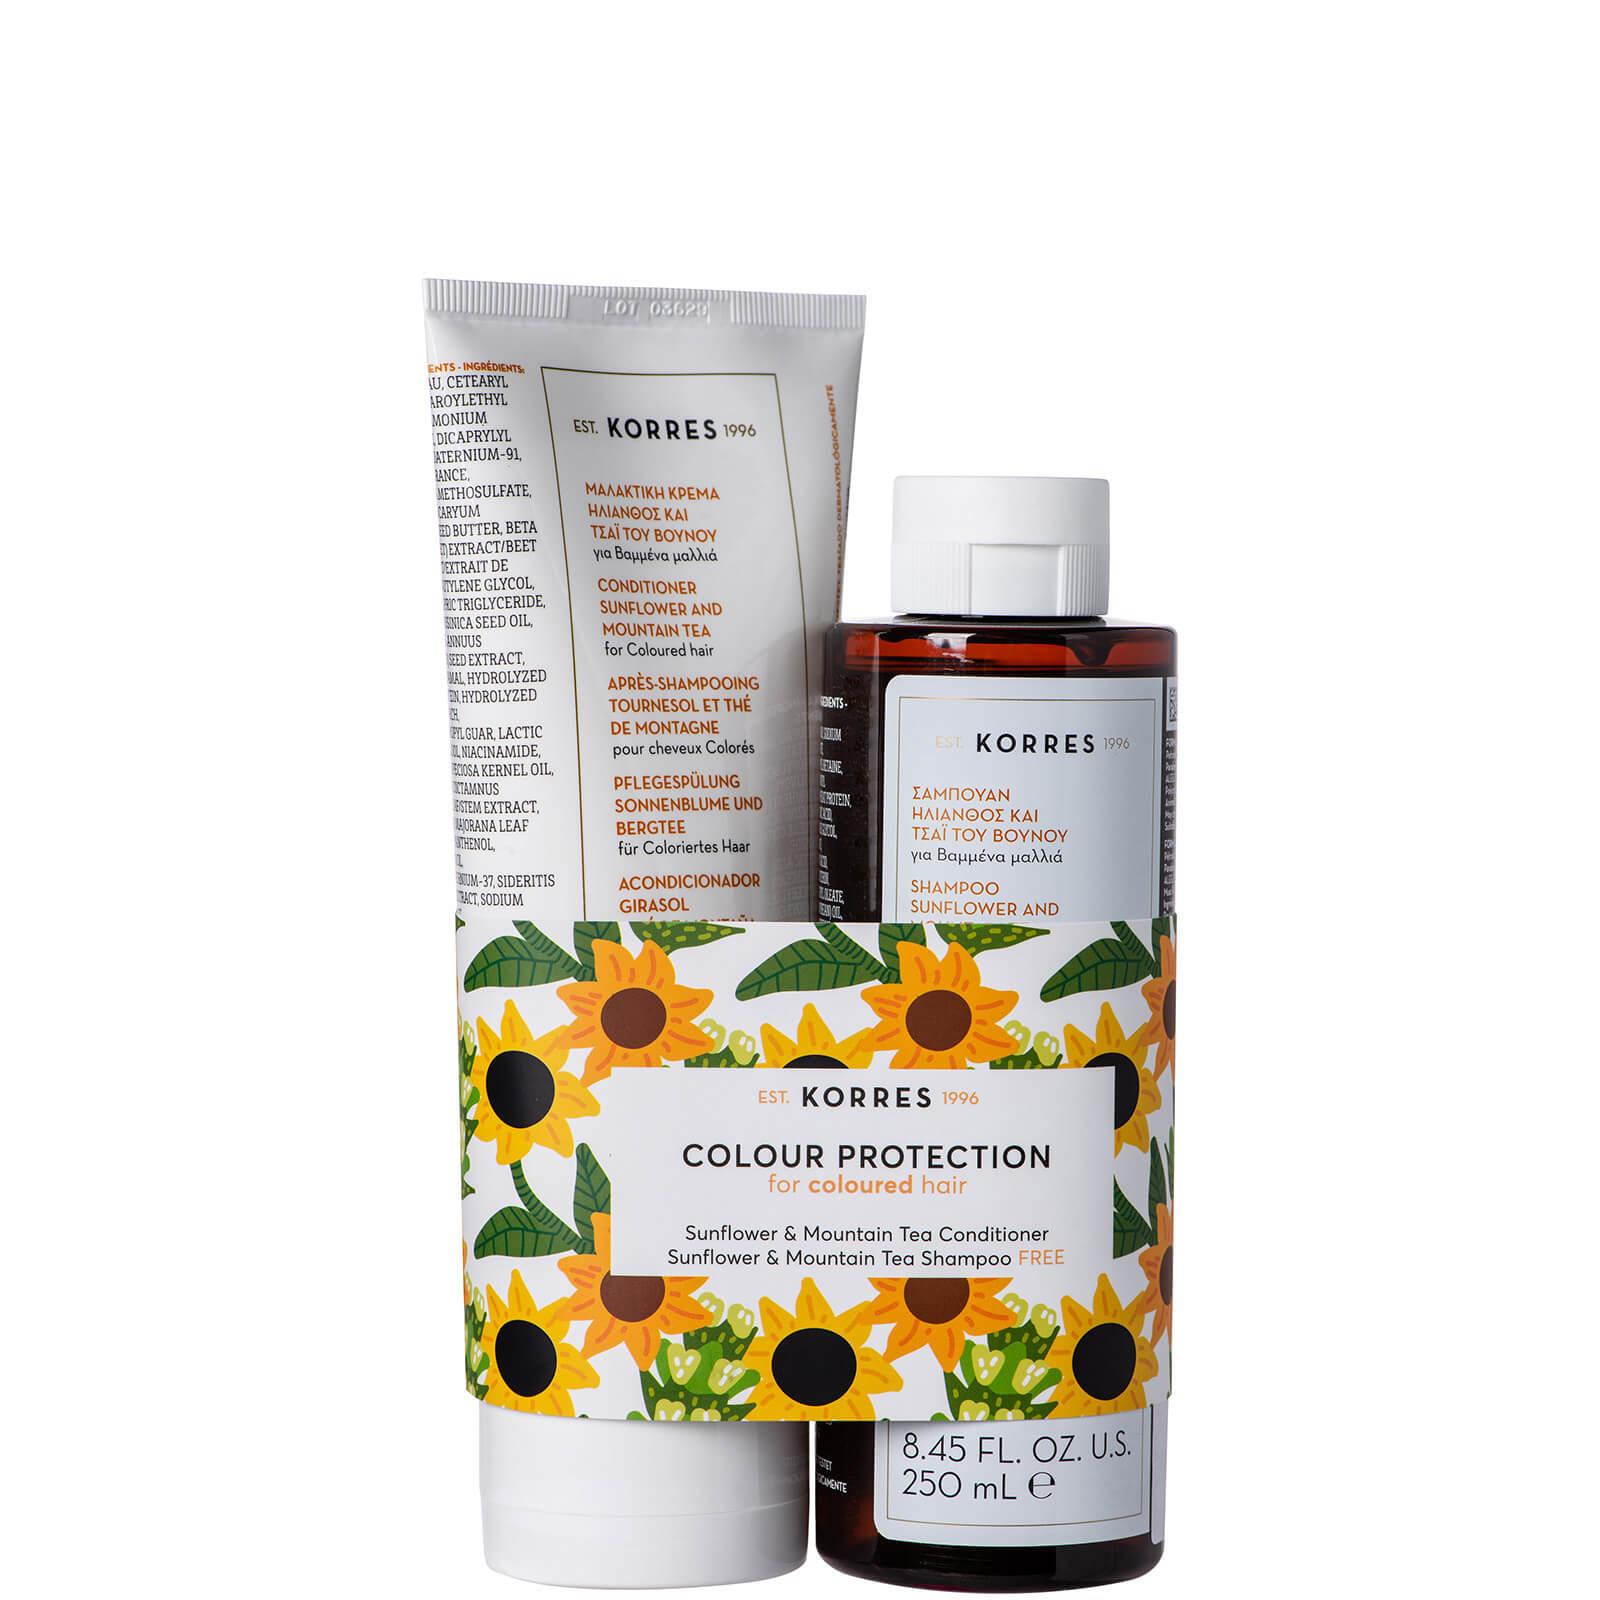 Купить KORRES Sunflower & Mountain Tea Kit Conditioner and Shampoo Duo